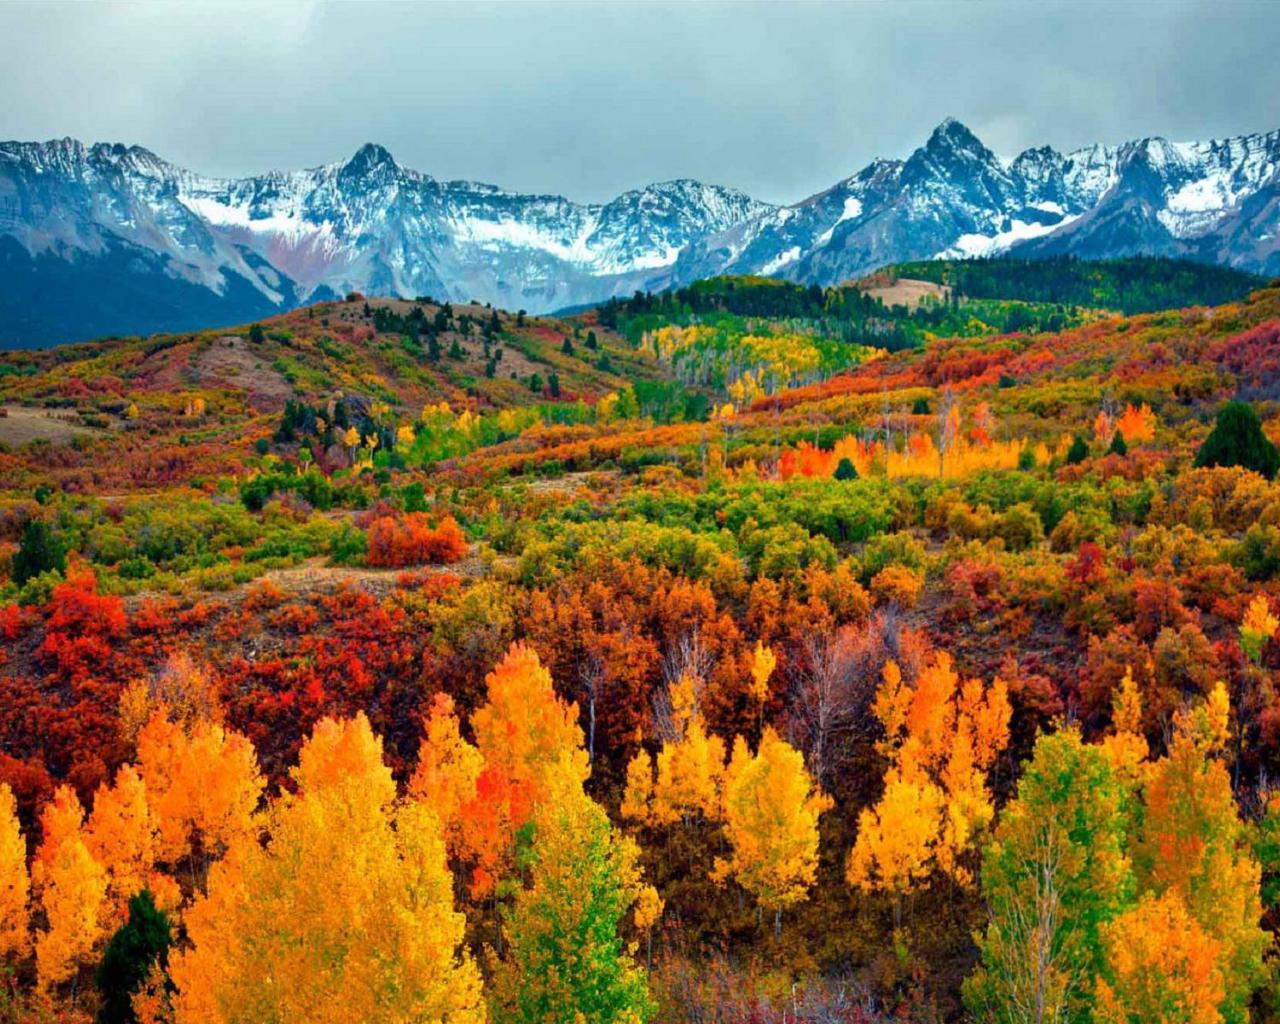 Colorado mountains wallpaper wallpapersafari - Colorado desktop background ...